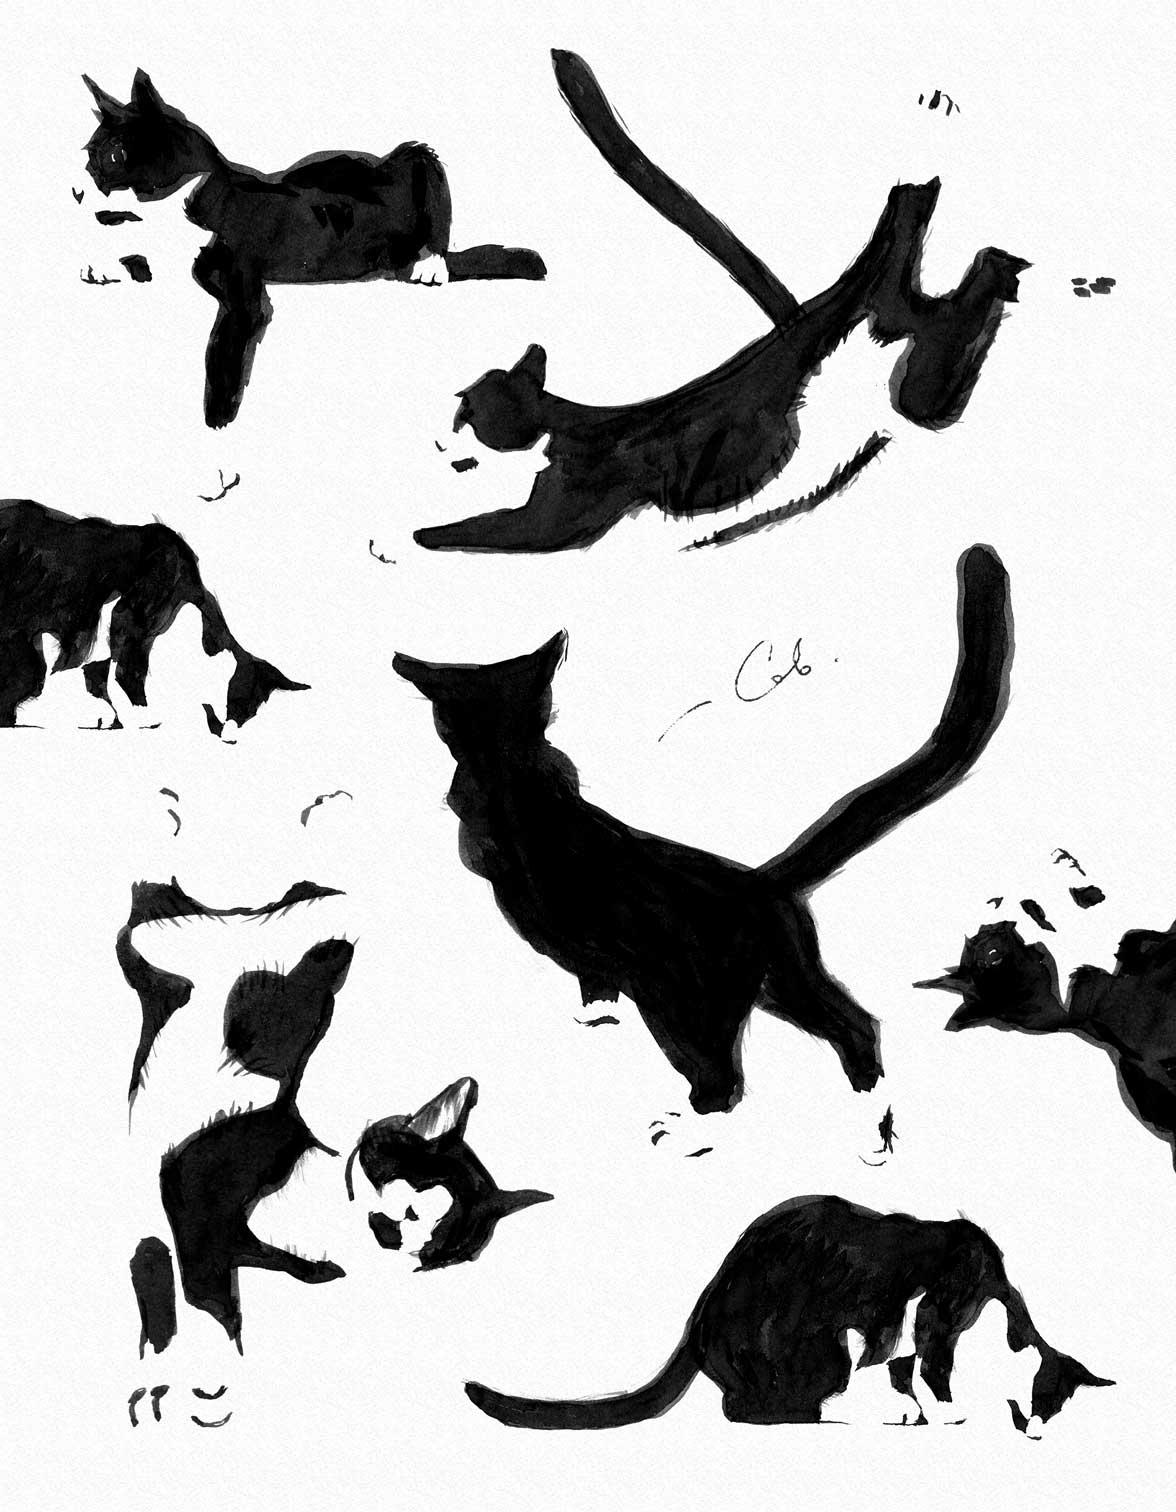 Косатики 2018, warqad, khad, 70х90, кот, кошка